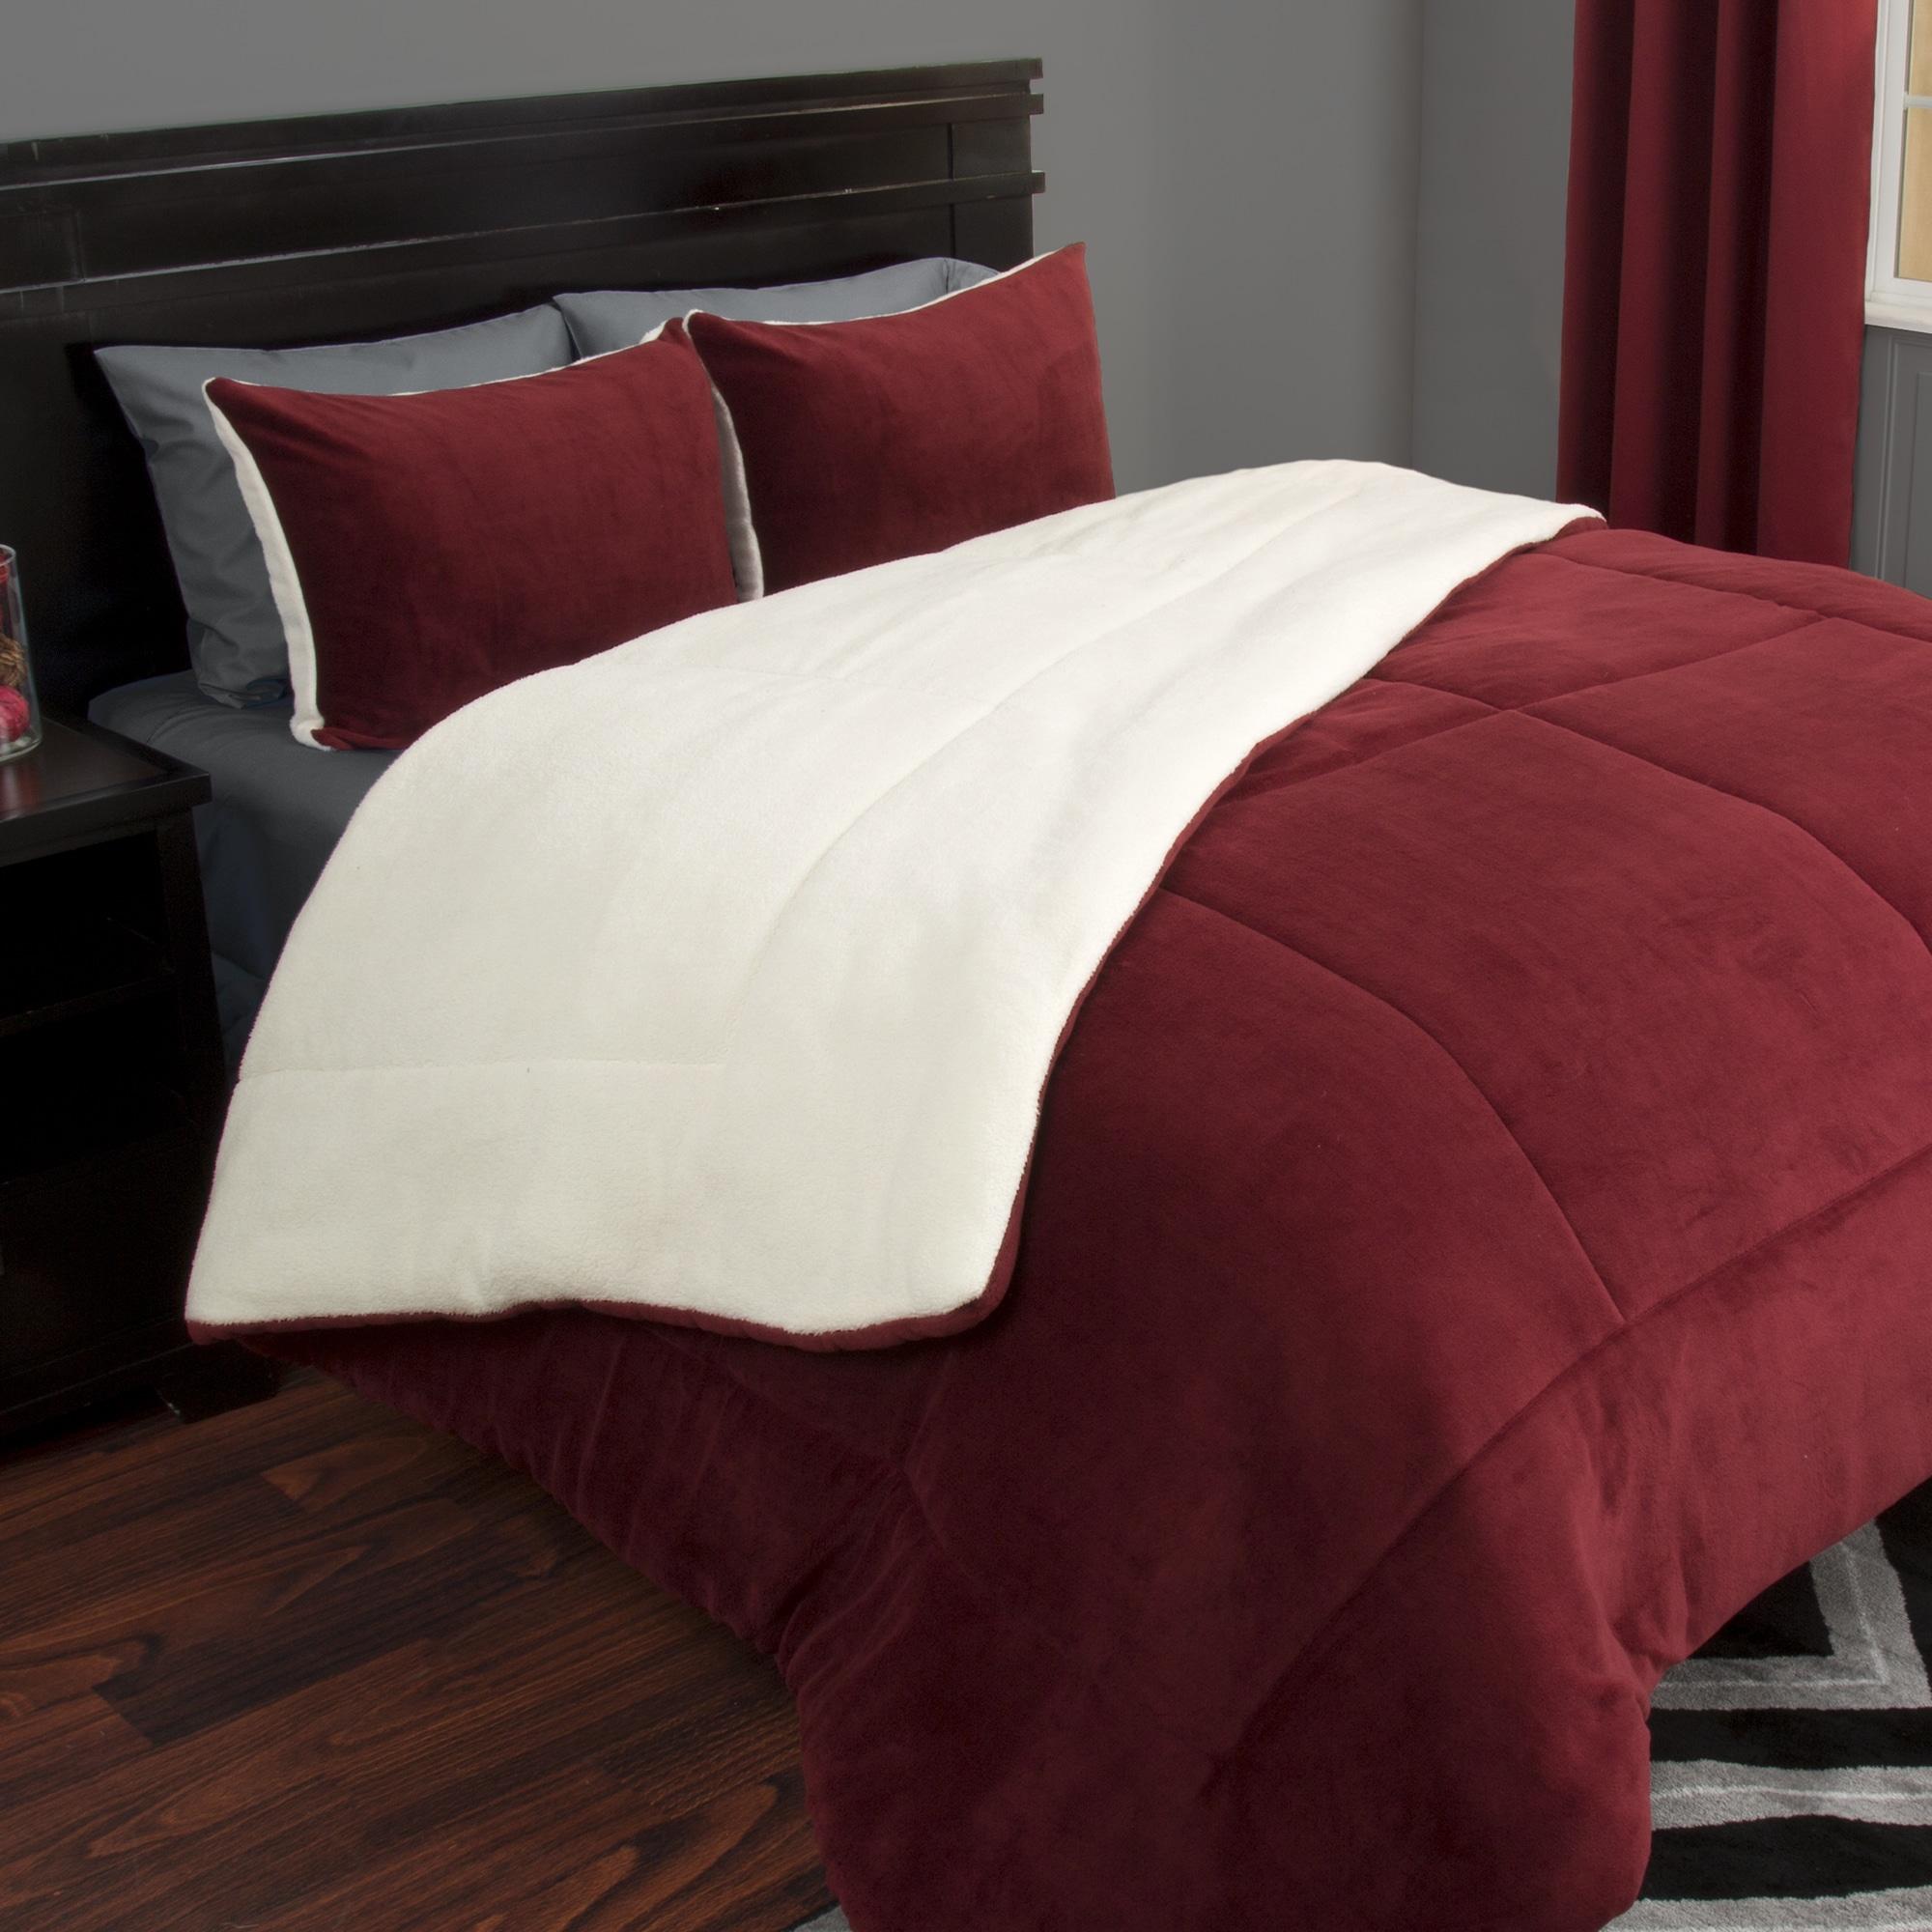 qlt microsuede prod comforters comforter chocolate cannon bedding wid tan bath home p set hei piece bed